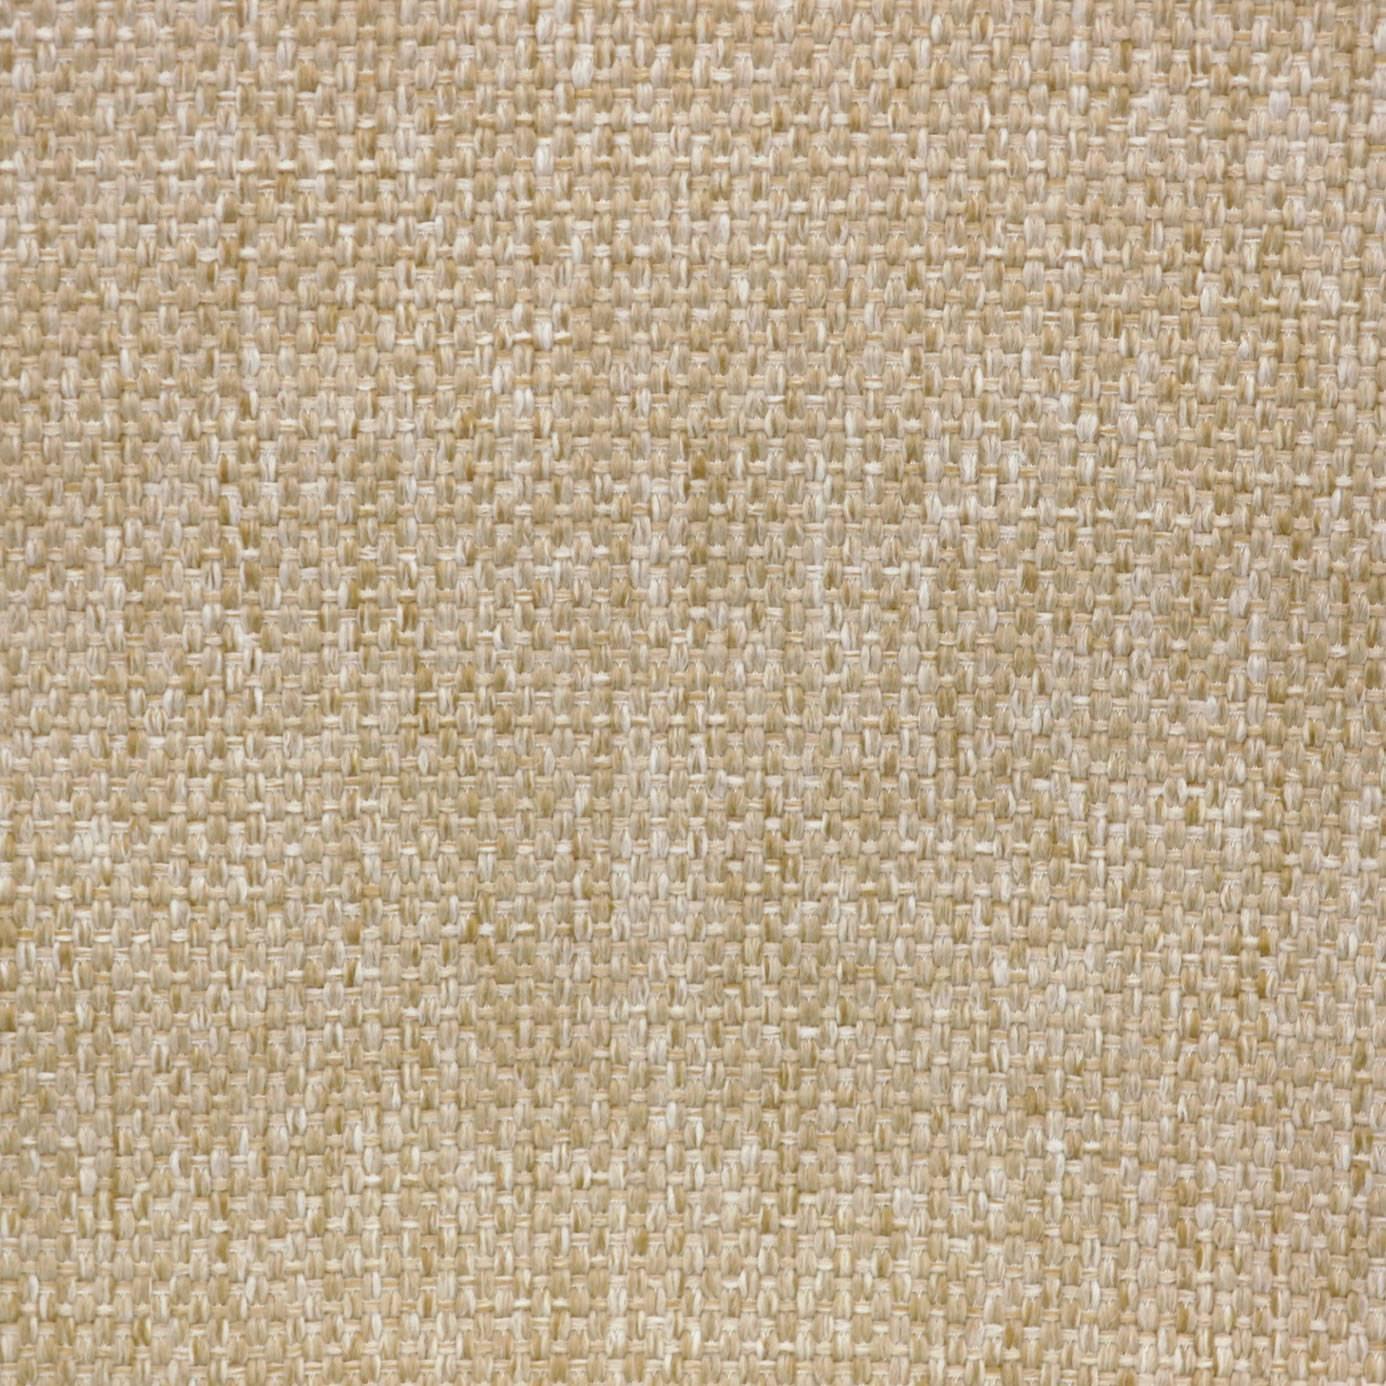 Berwick Fabric Sand 7103 504 Prestigious Textiles